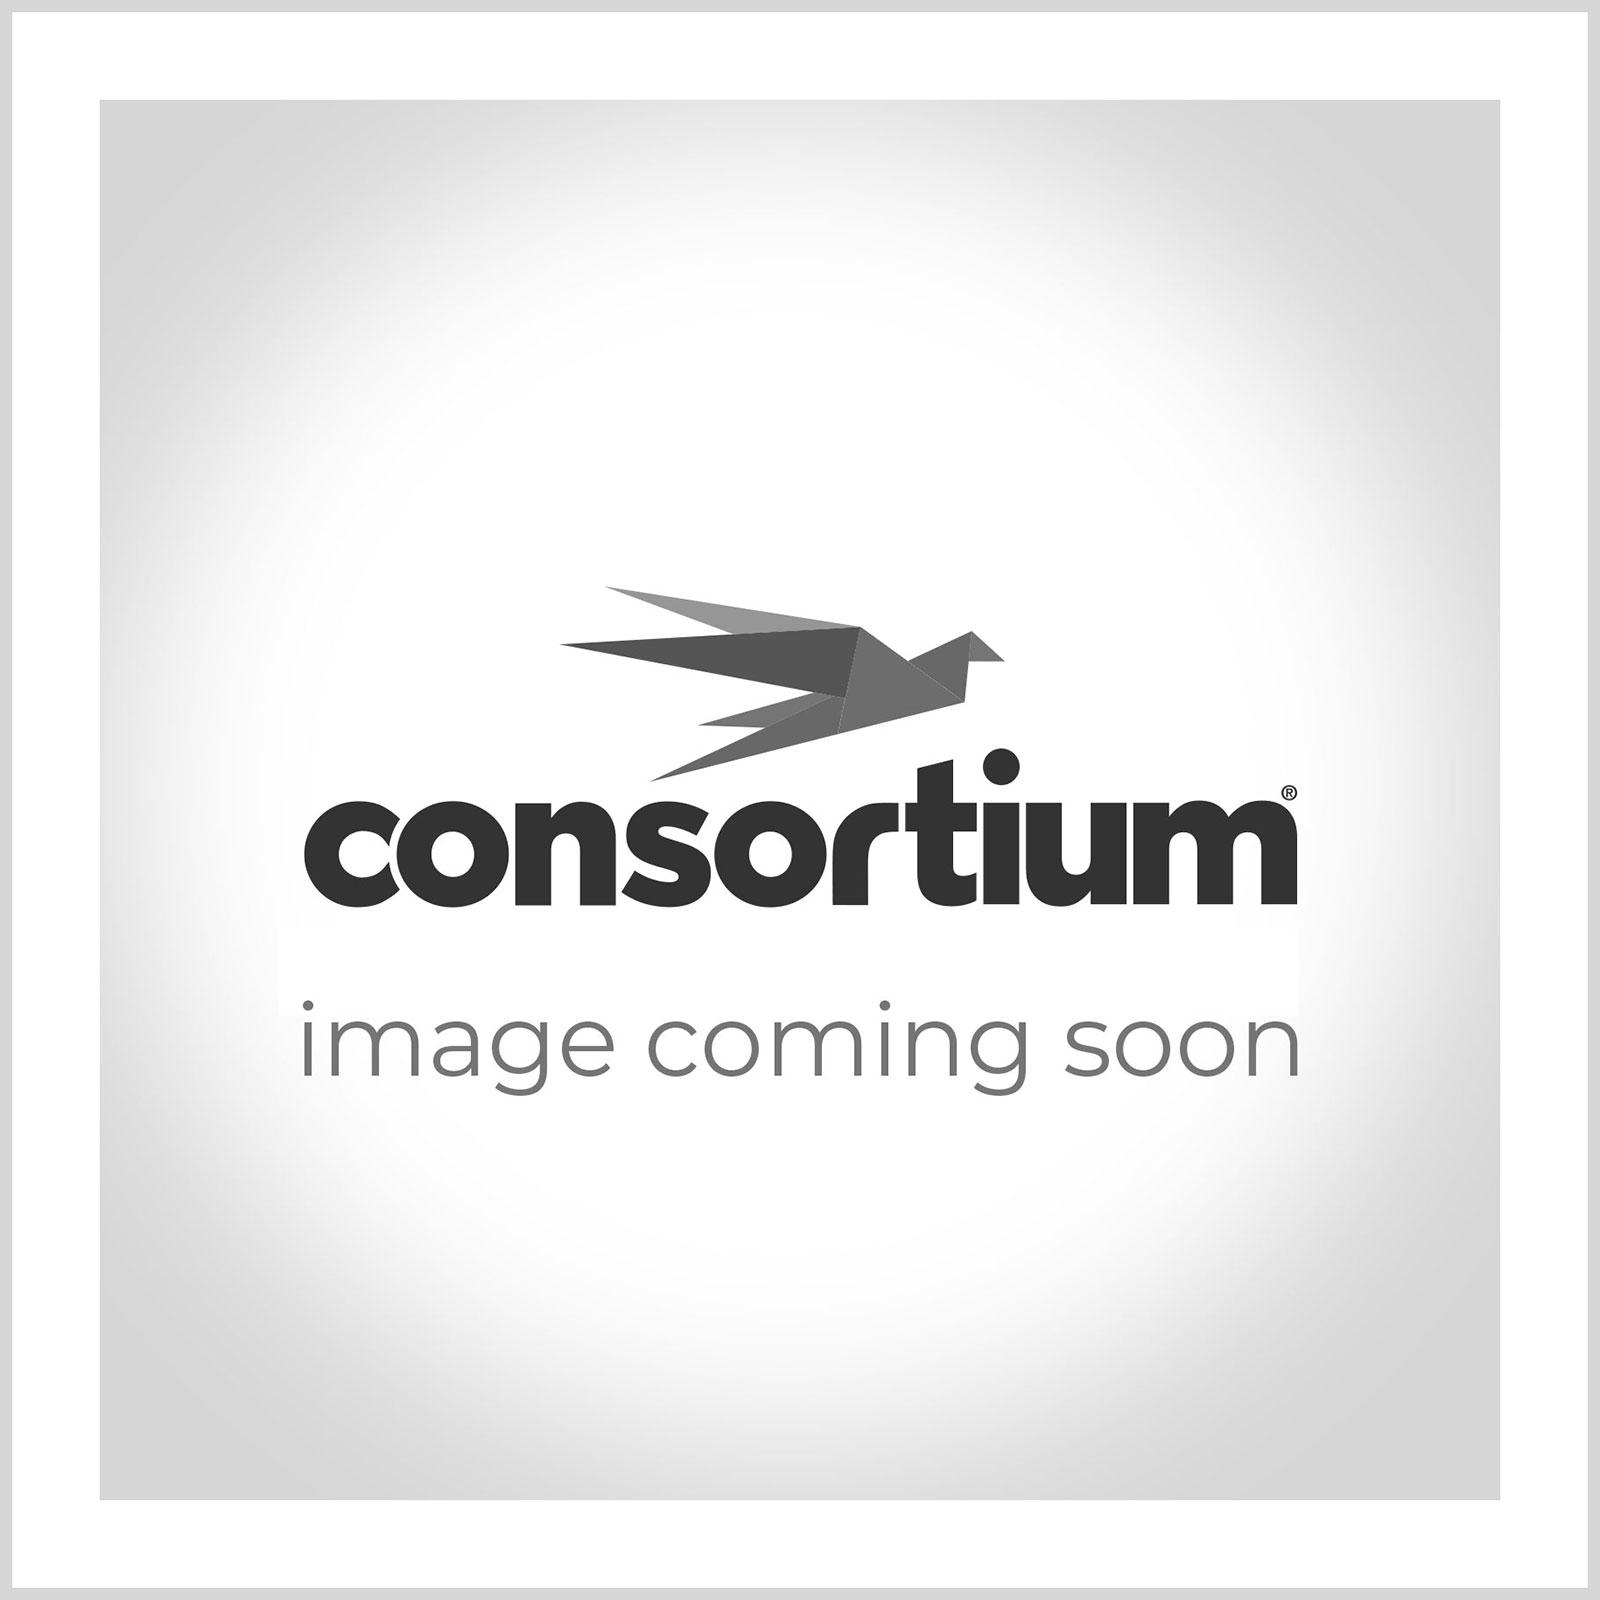 Harley Stainless Steel Cutlery